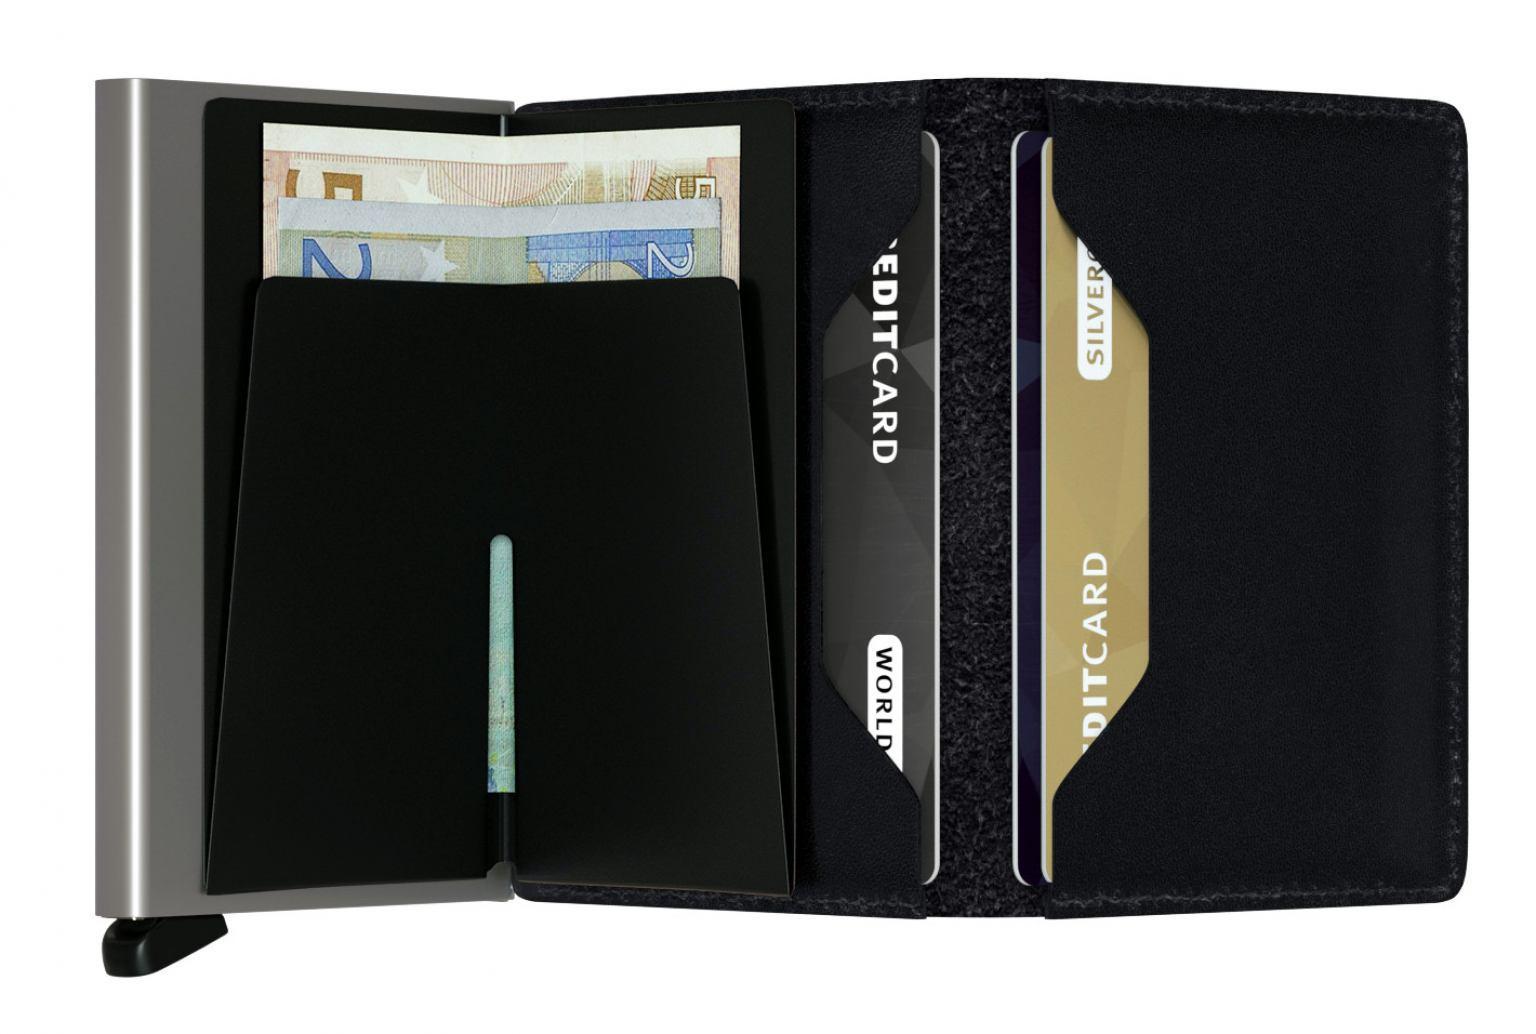 Secrid Cardprotector Slimwallet RFID-Schutz Black